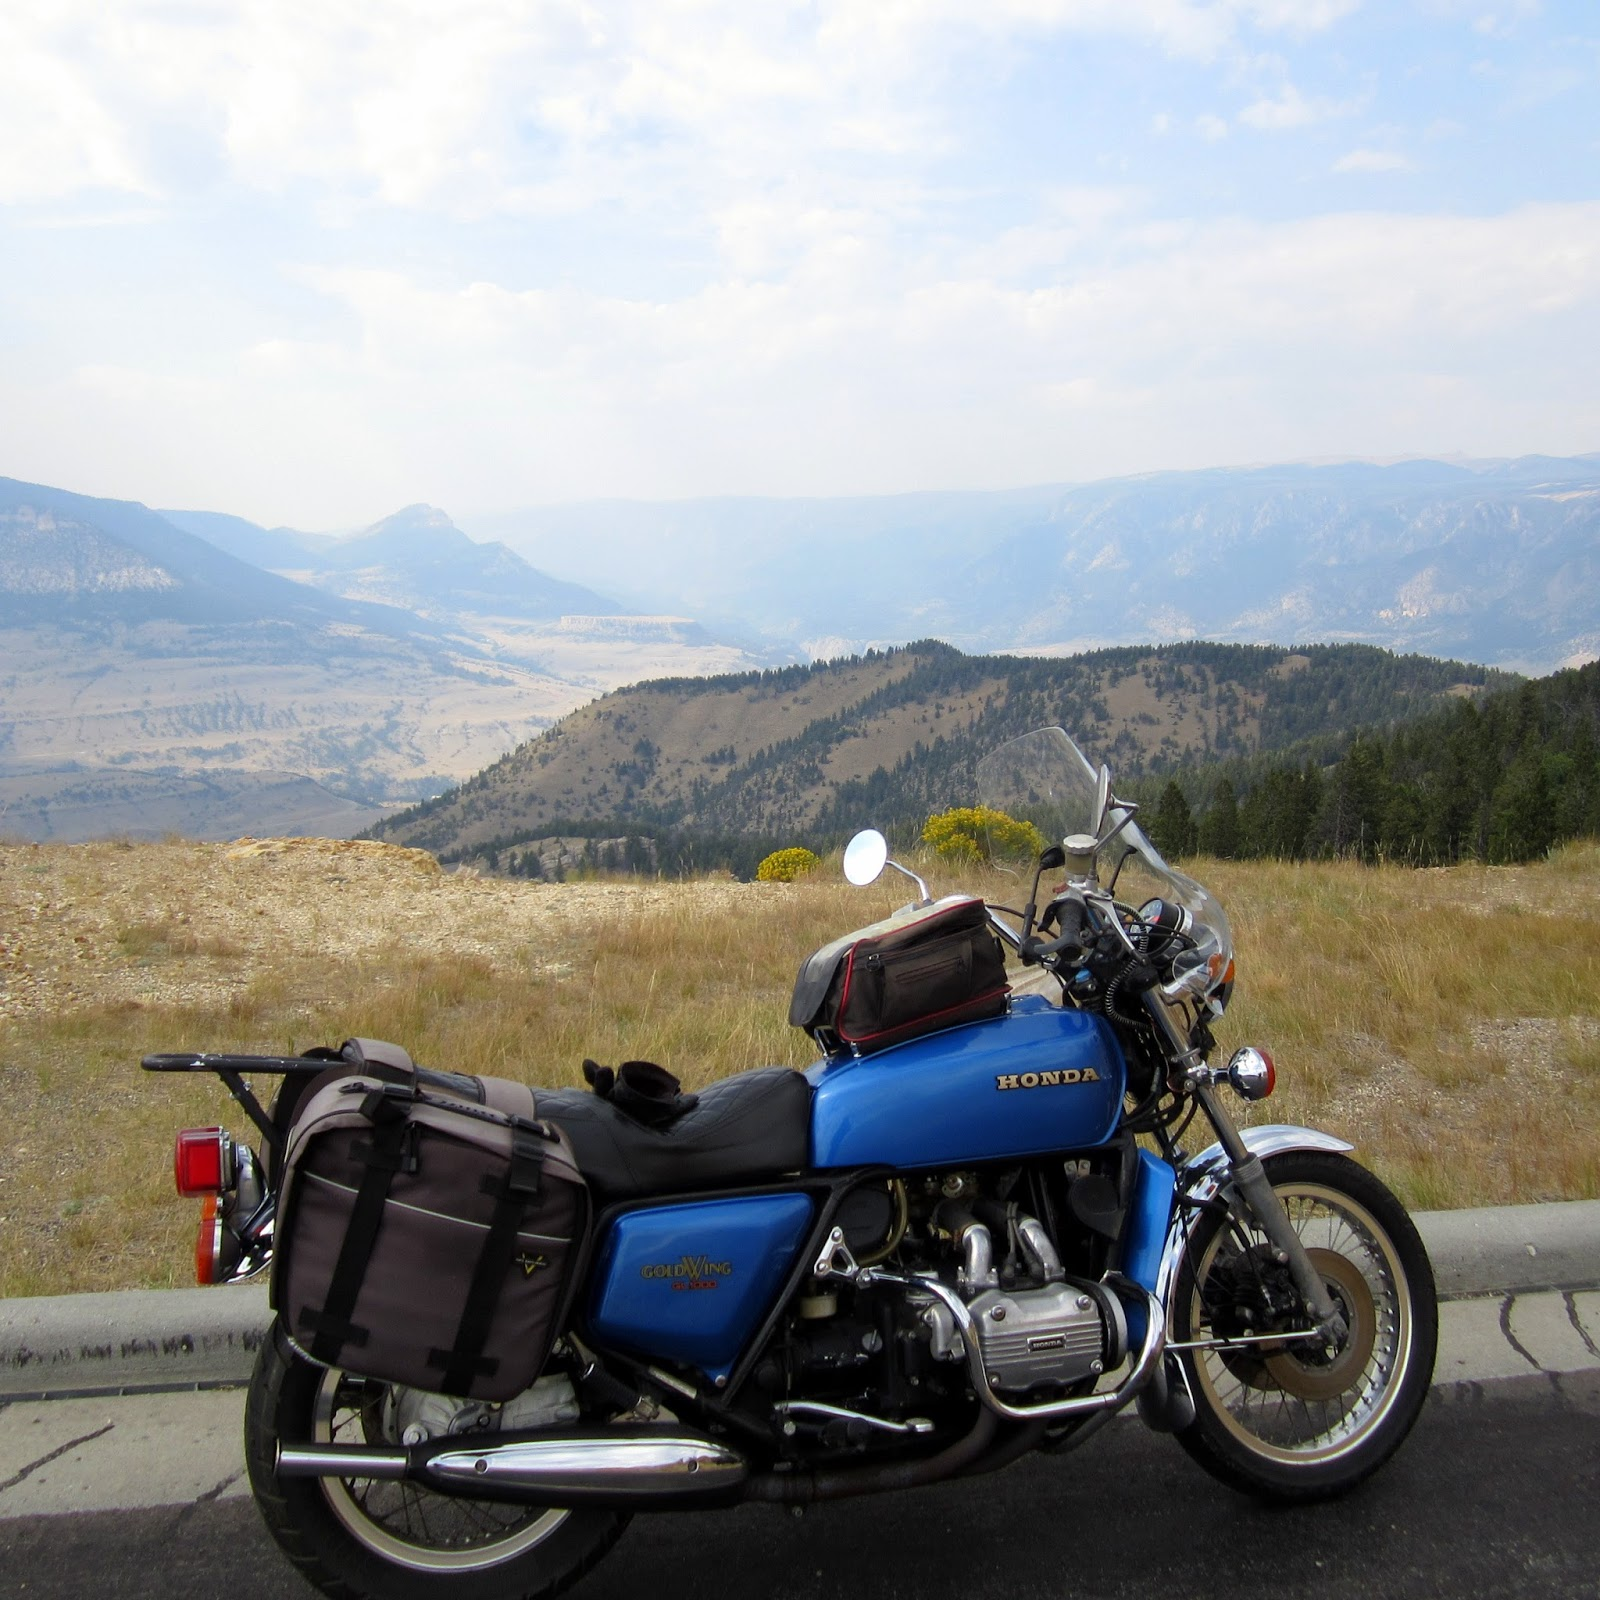 78-81 gl1100 (goldwing)? | Adventure Rider